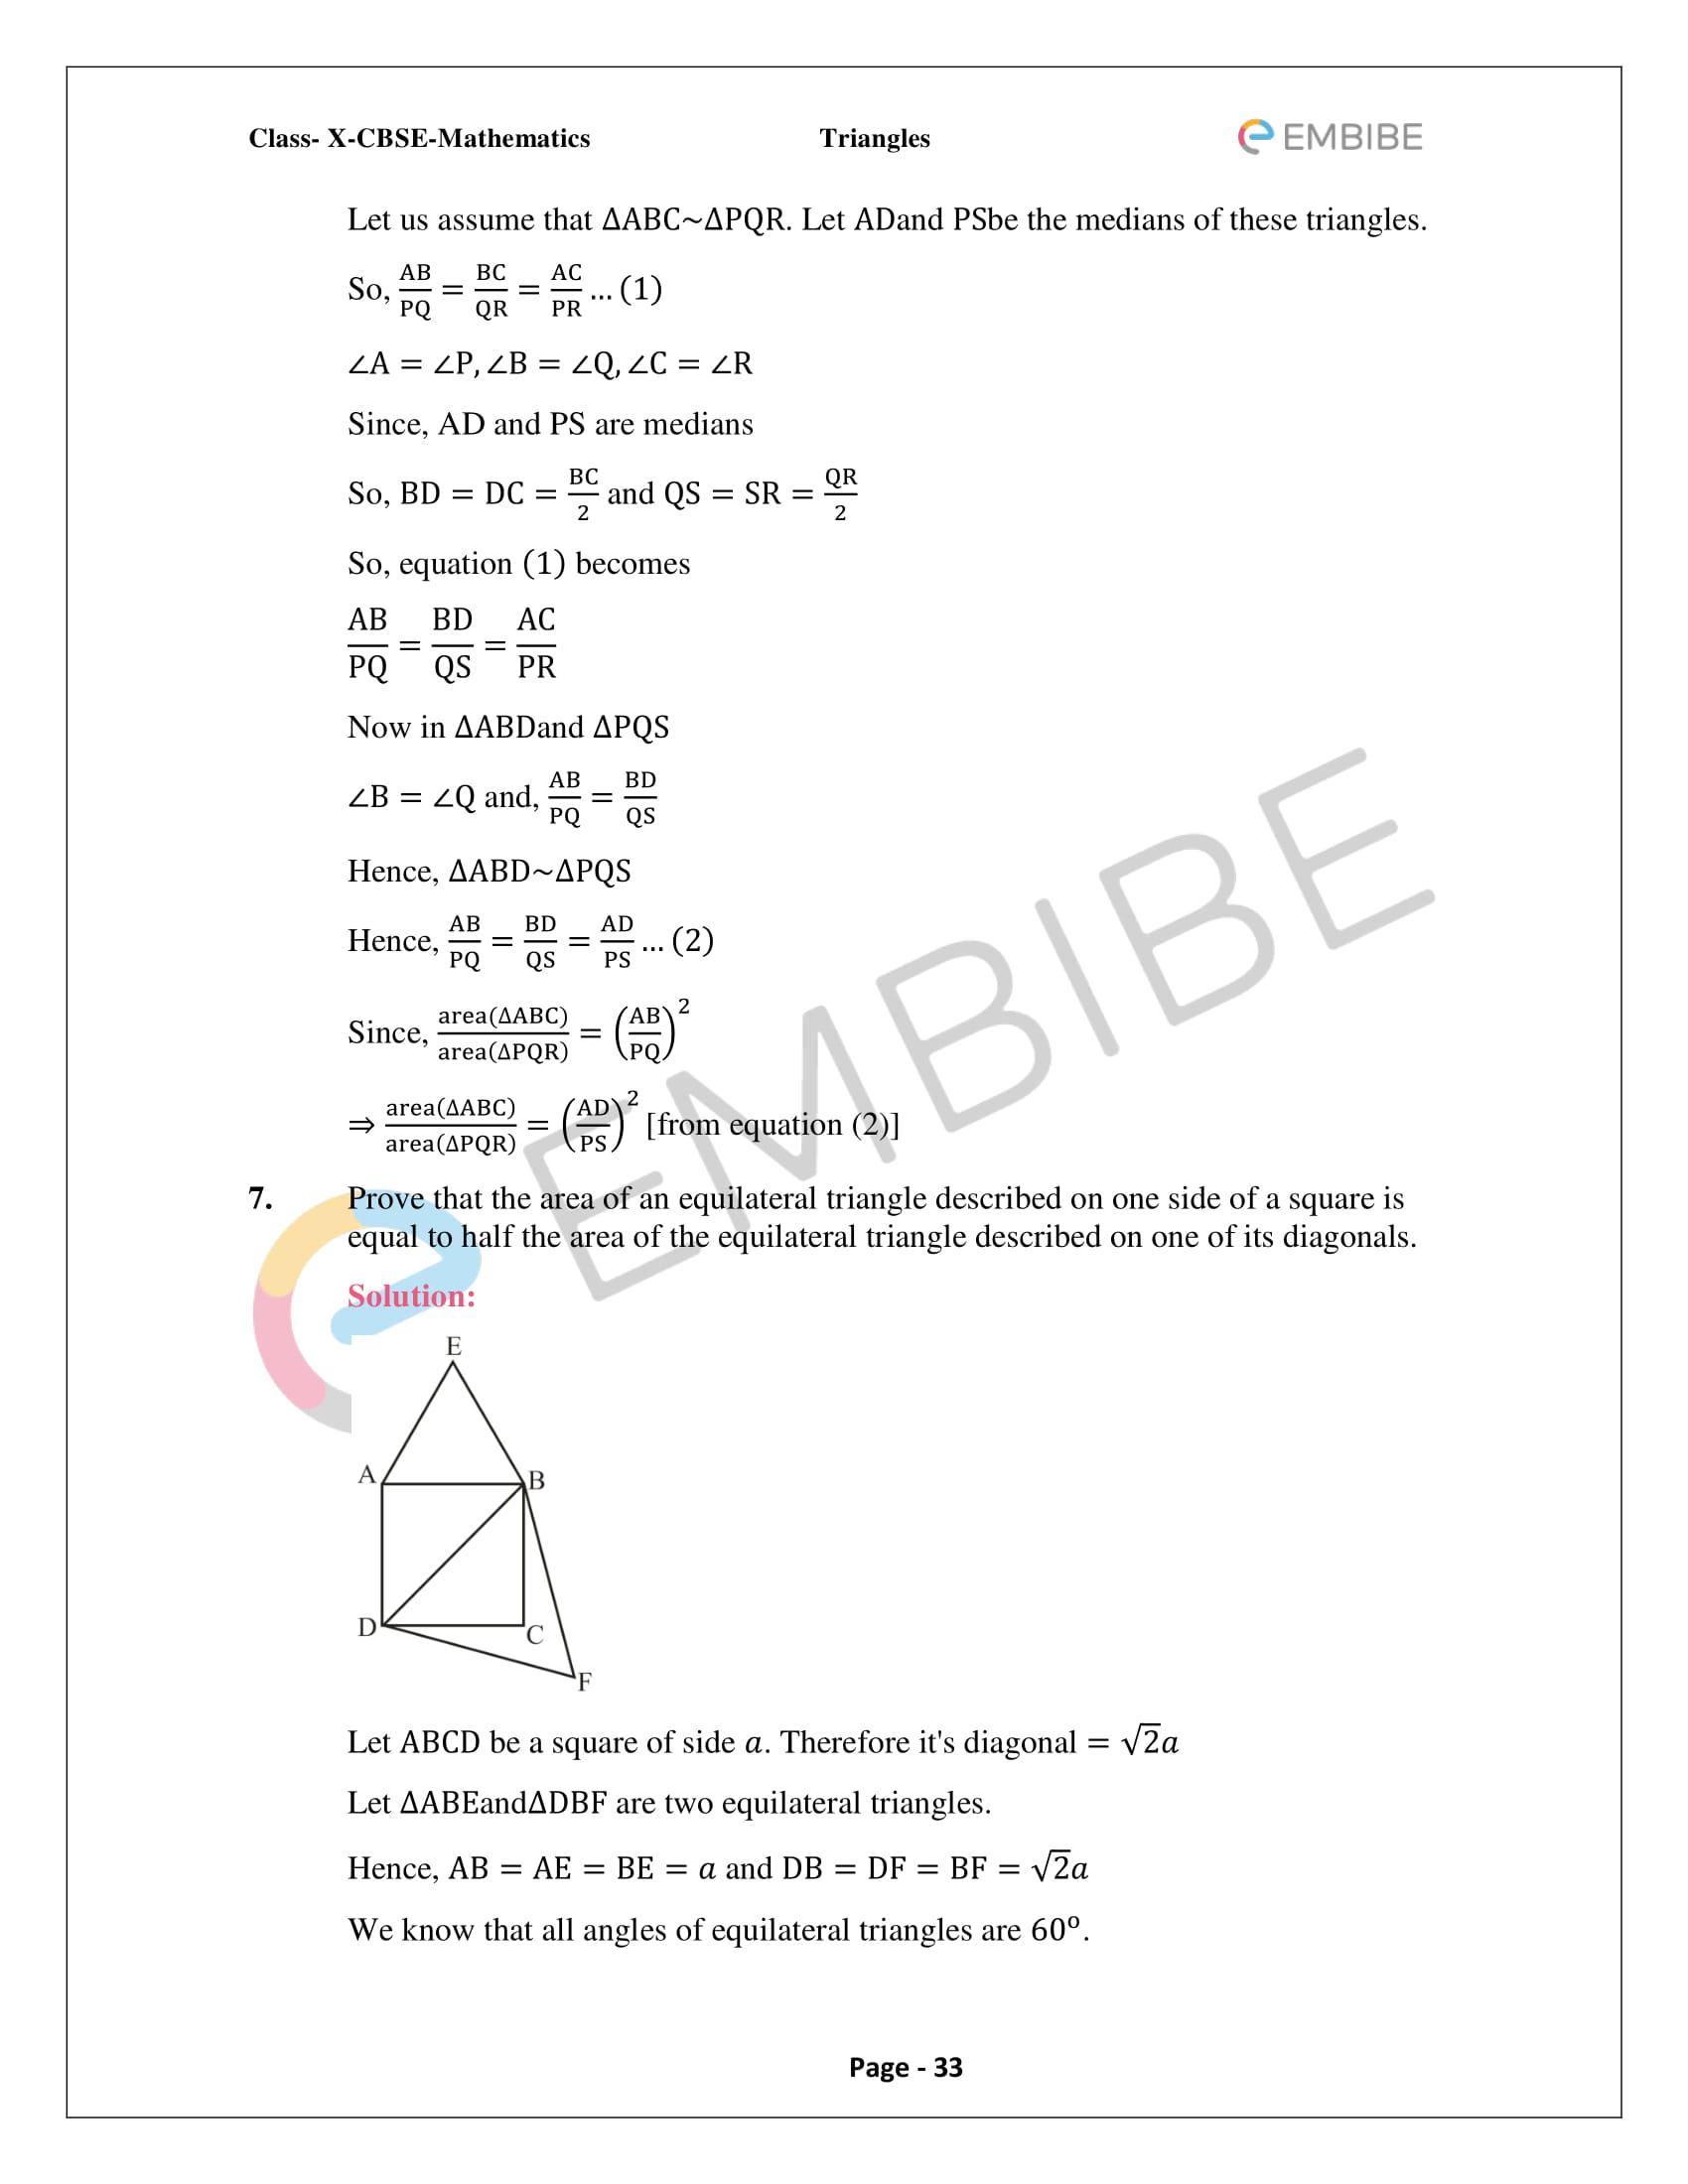 CBSE NCERT Solutions For Class 10 Maths Chapter 6 – Triangles